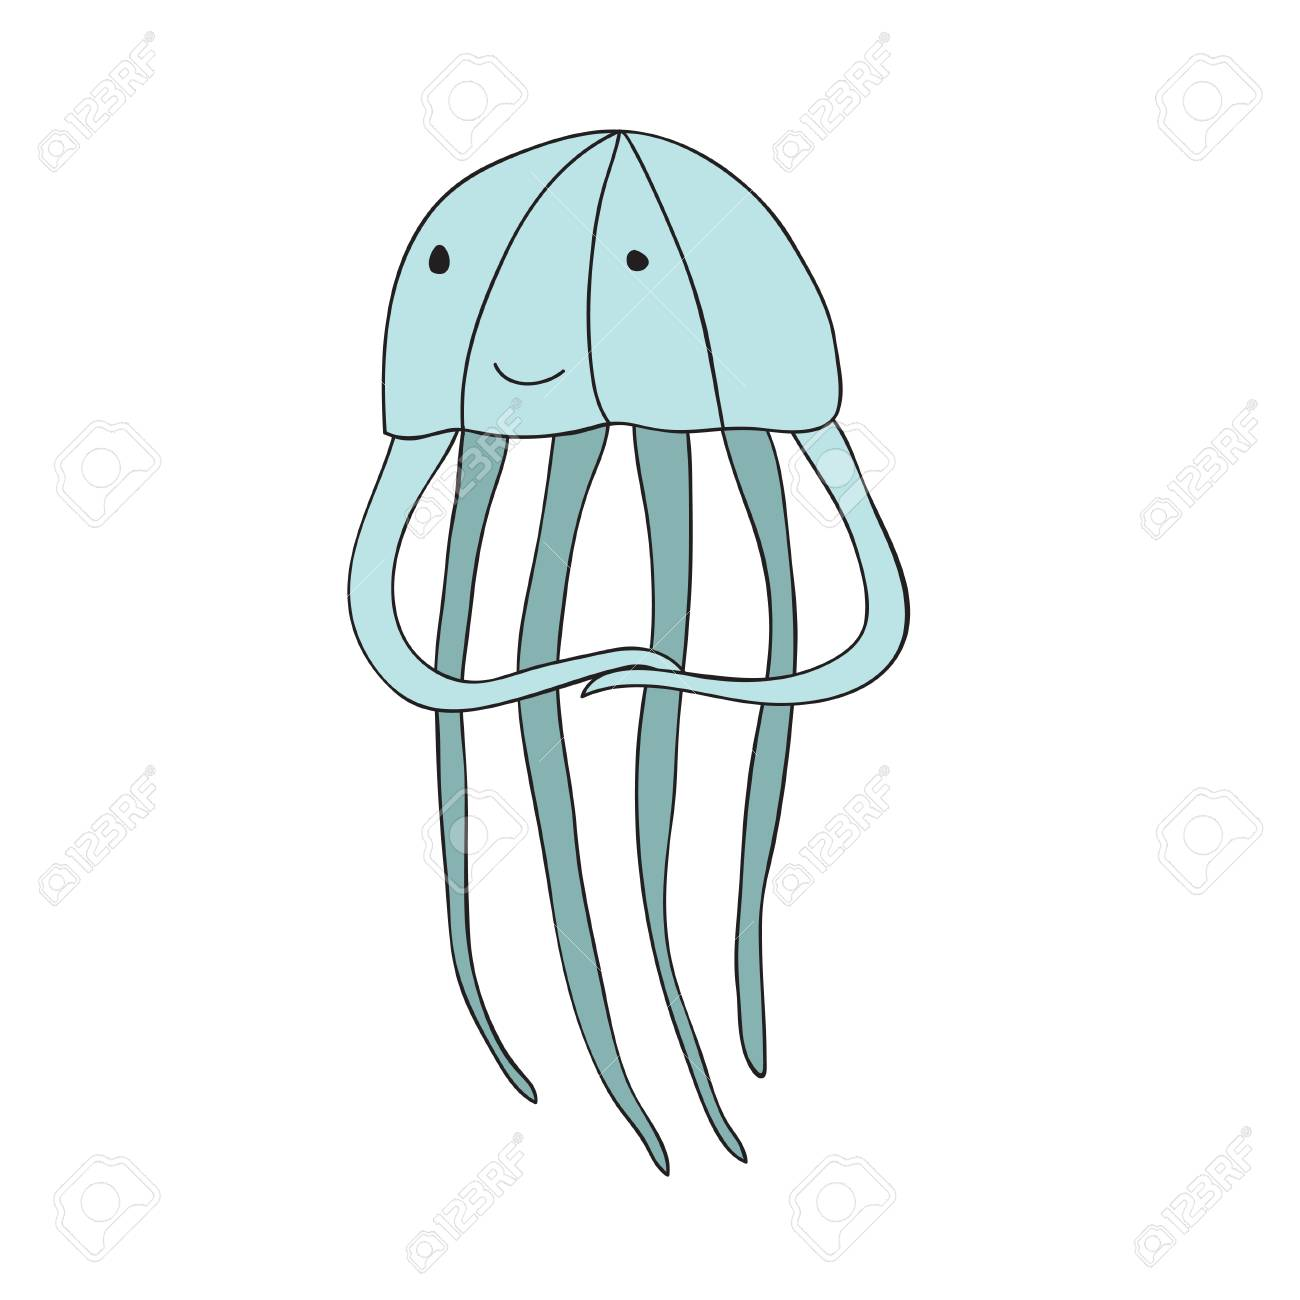 Cute Cartoon Jellyfish Character Vector Illustration In Simple